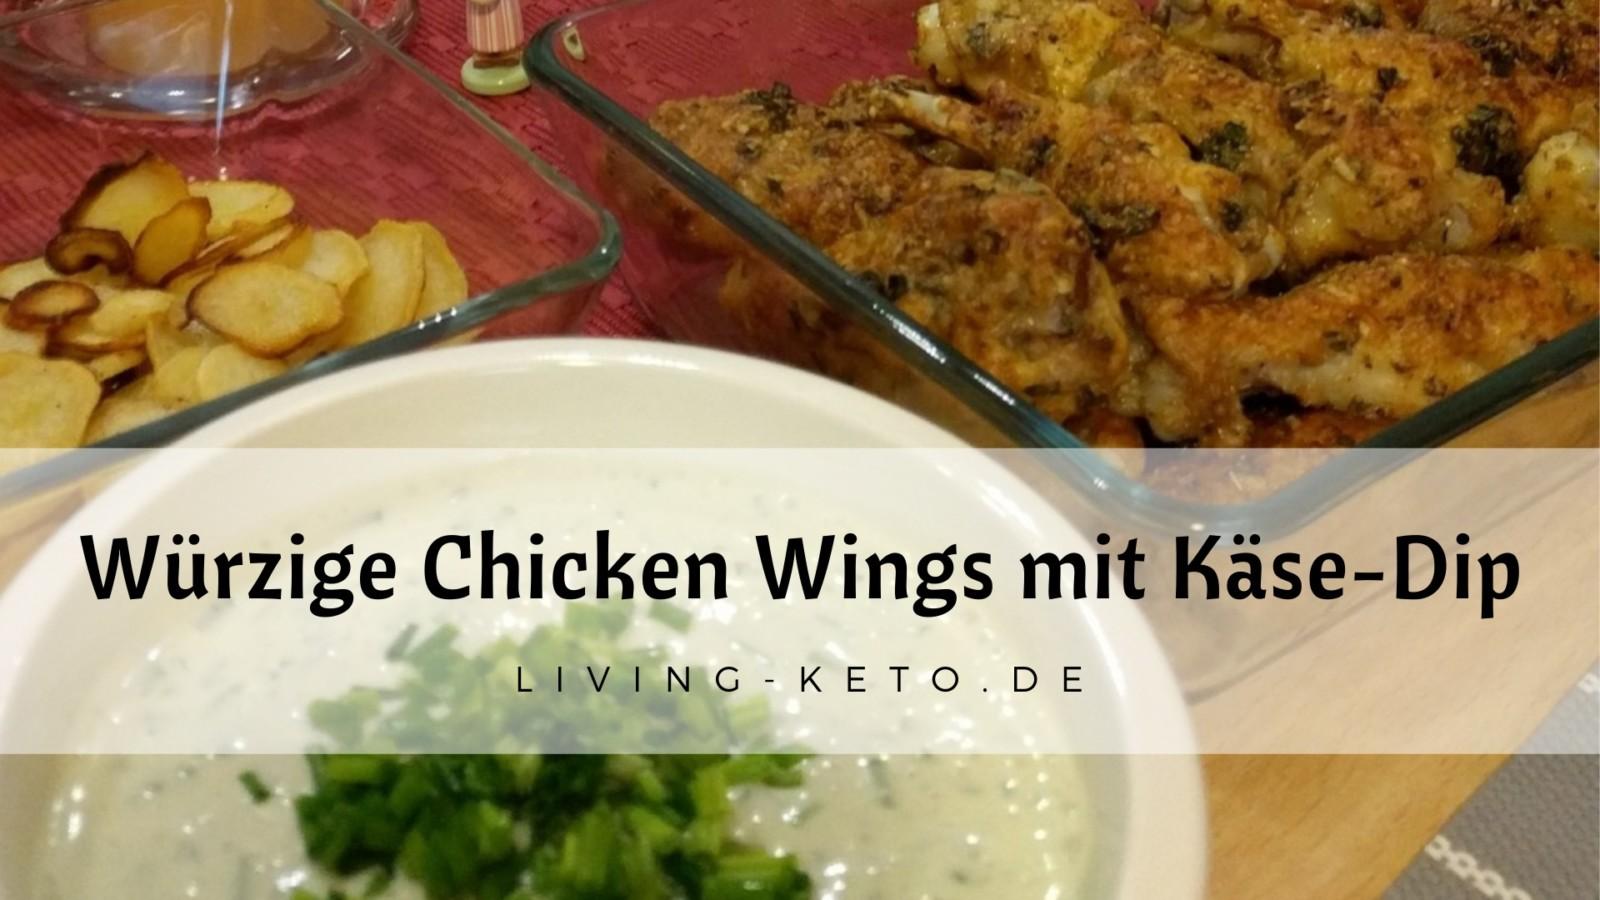 Würzig panierte Chicken Wings mit Käse-Dip